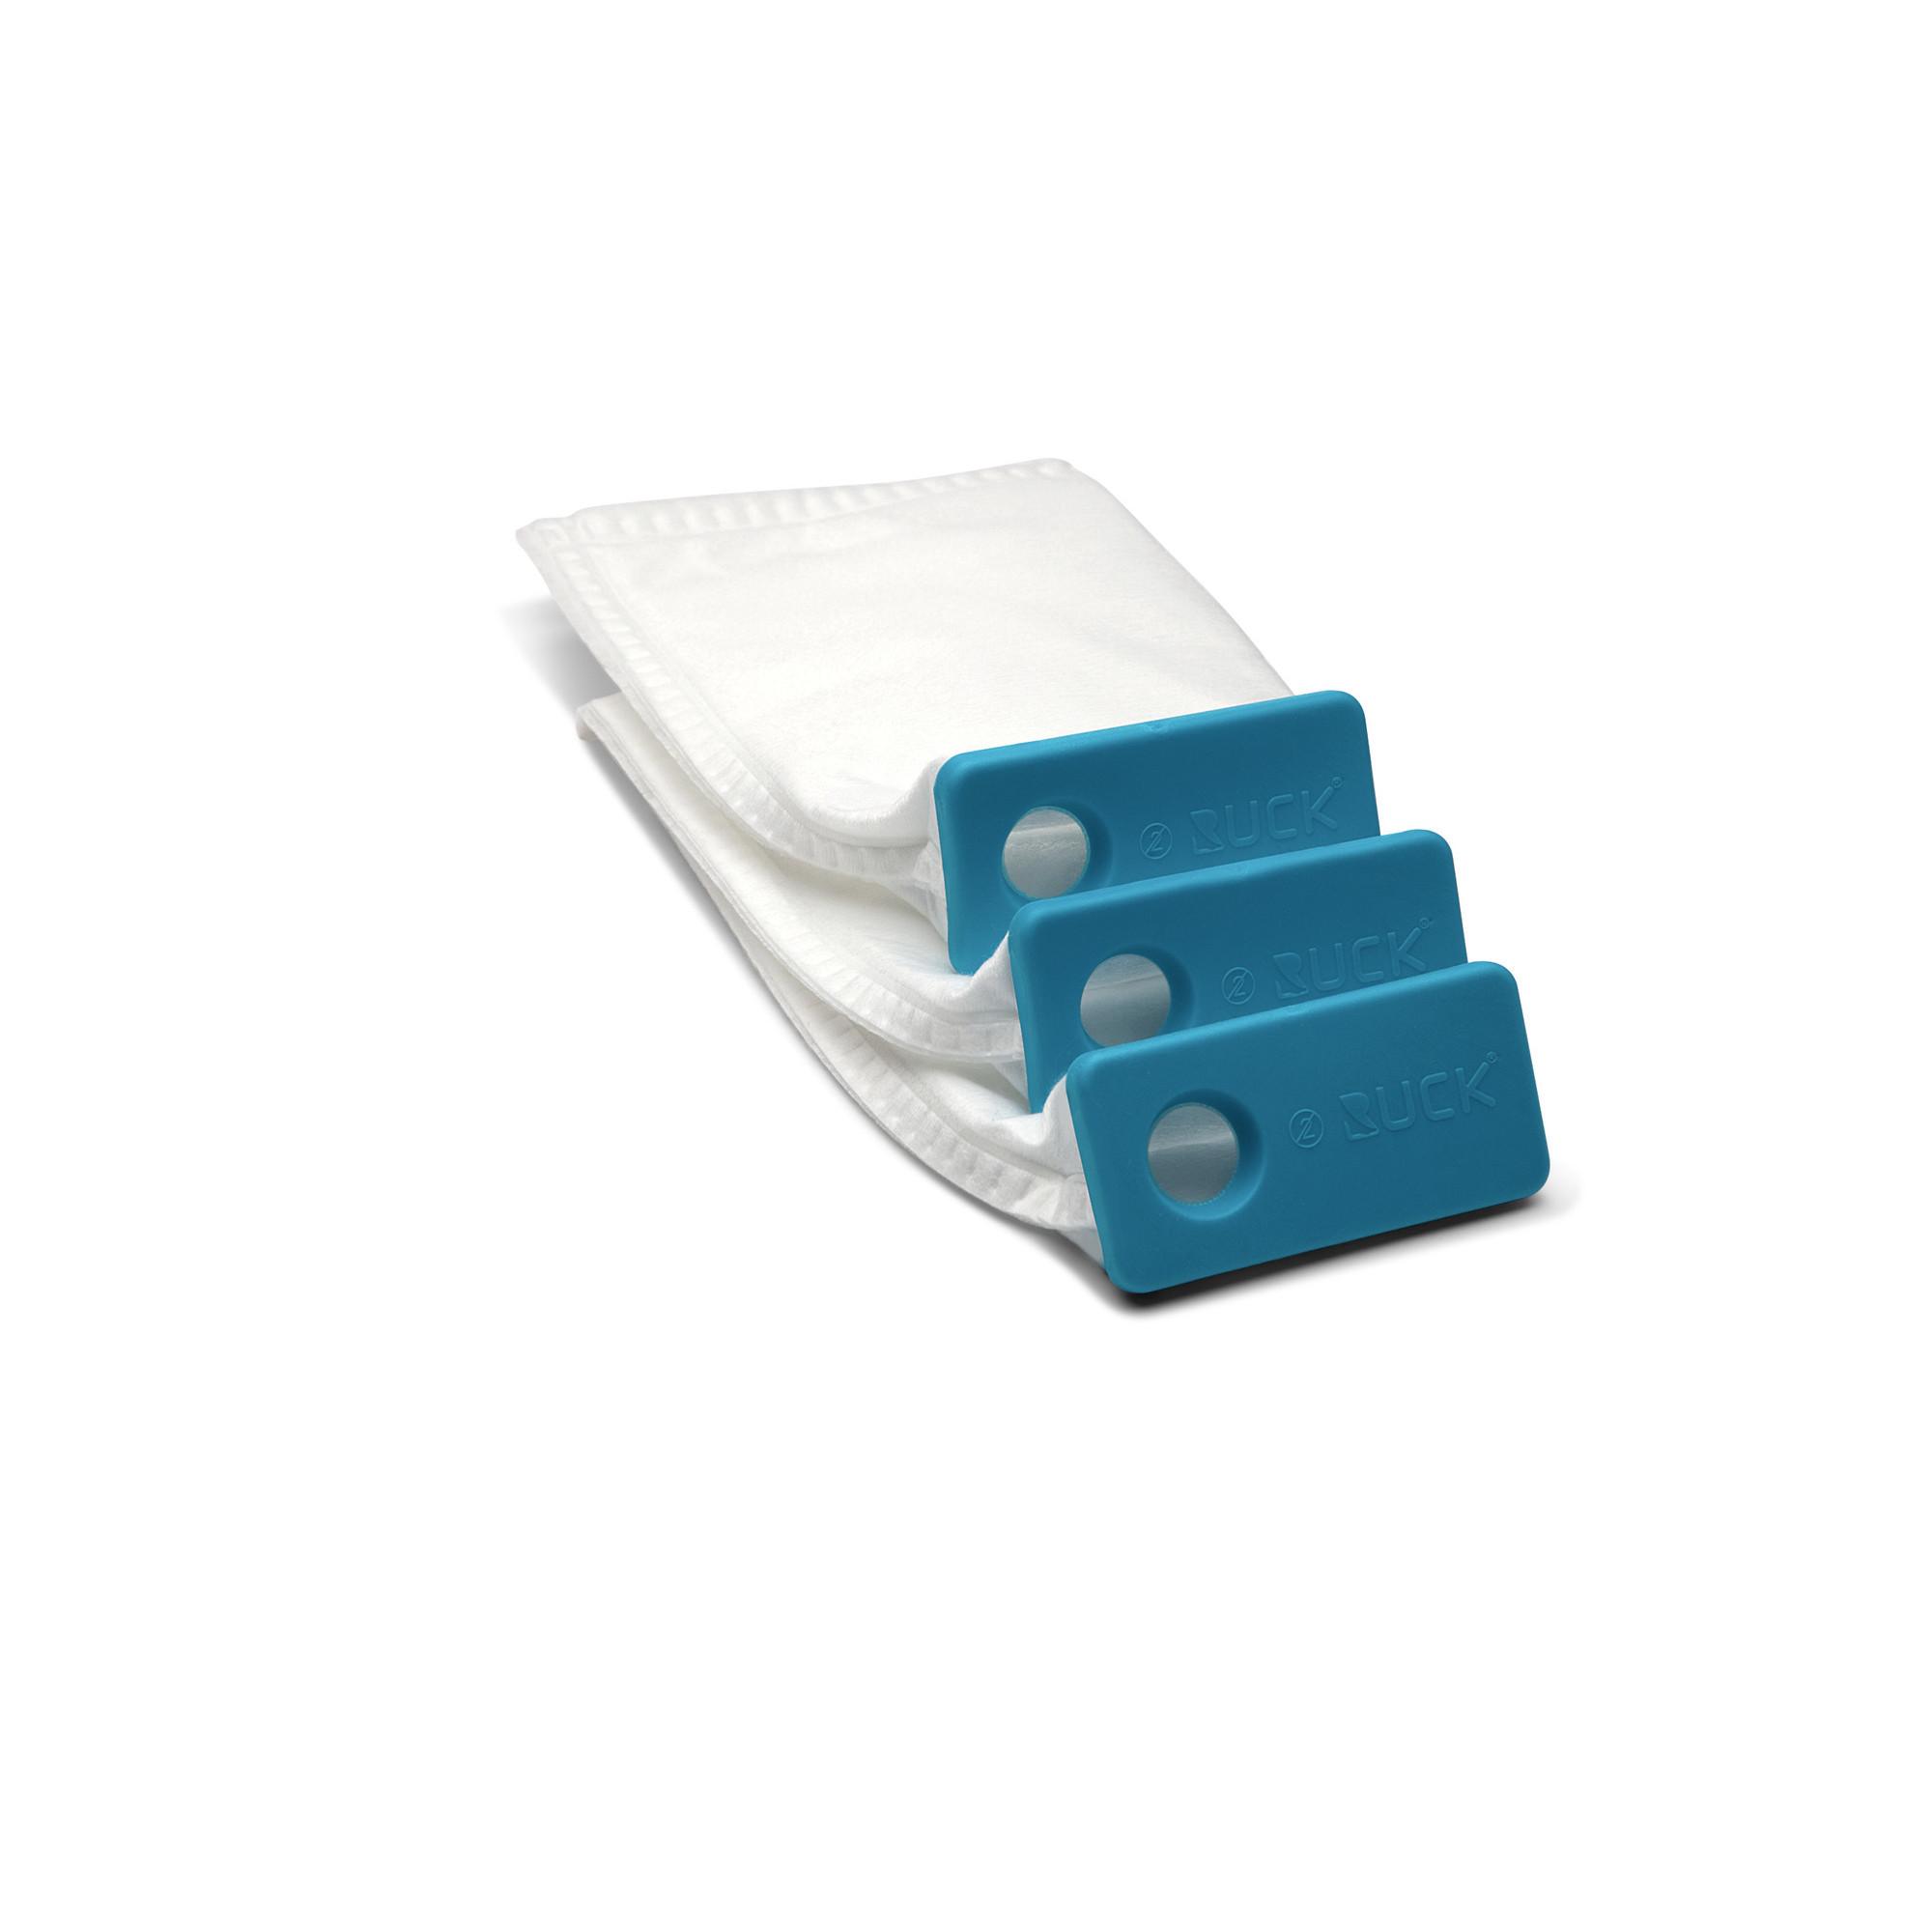 Filtres Micromoteur - Podolog Nova 3 - Ruck